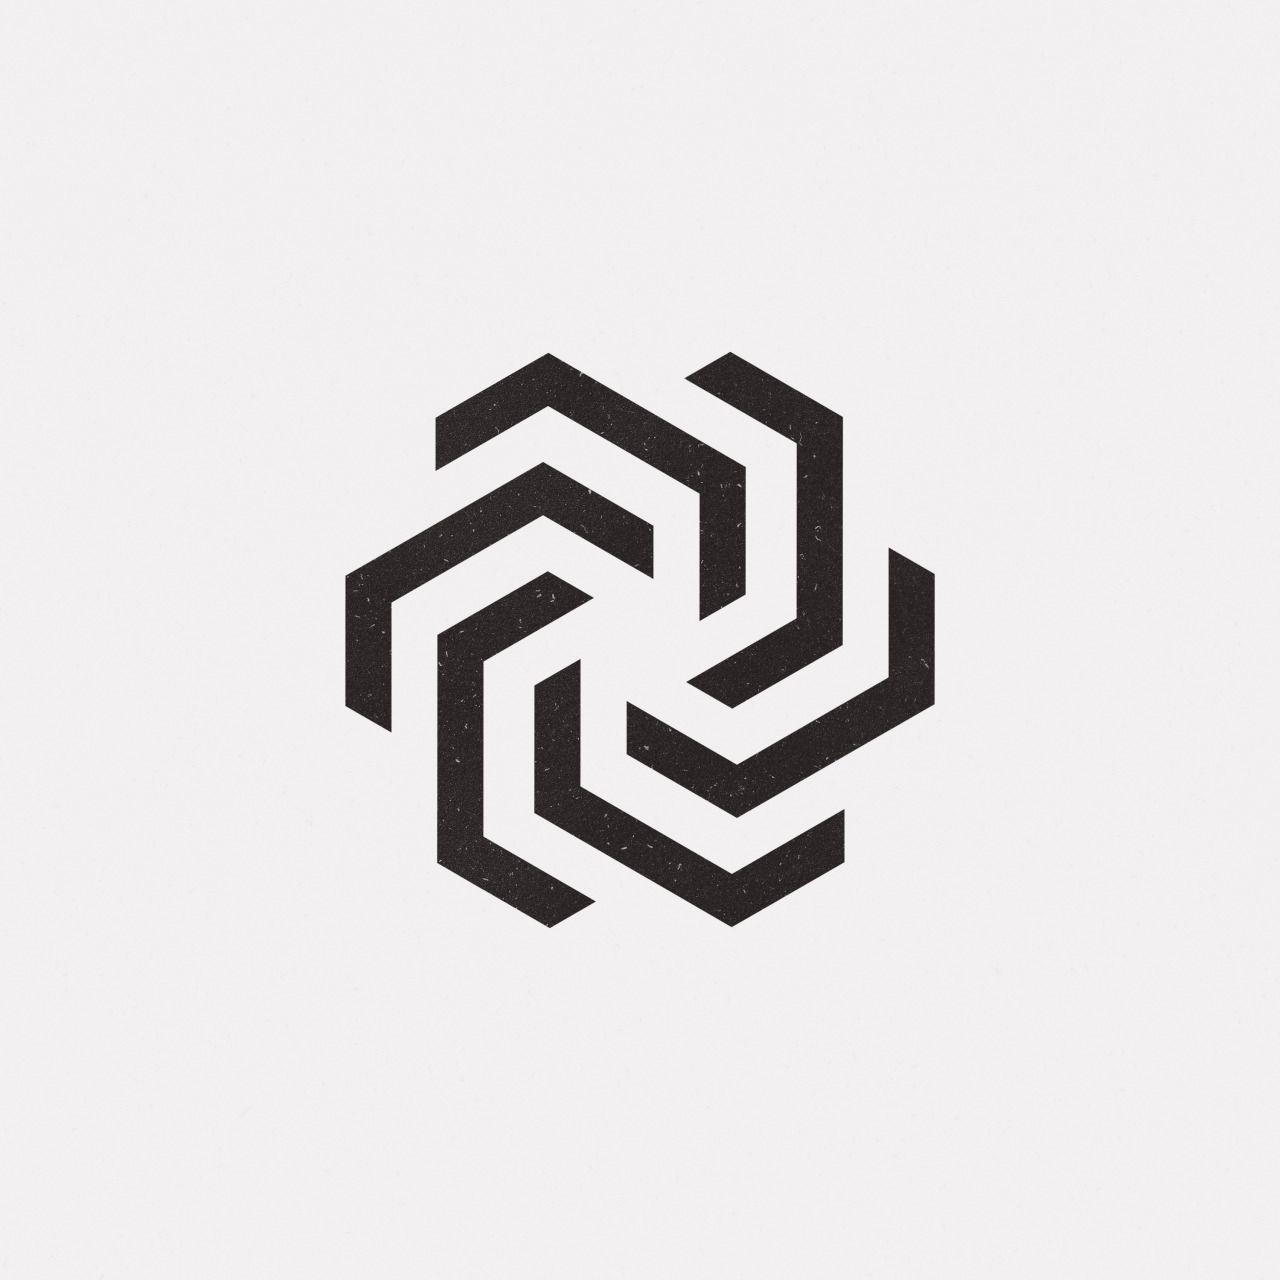 #JA17-821 A new geometric design every day